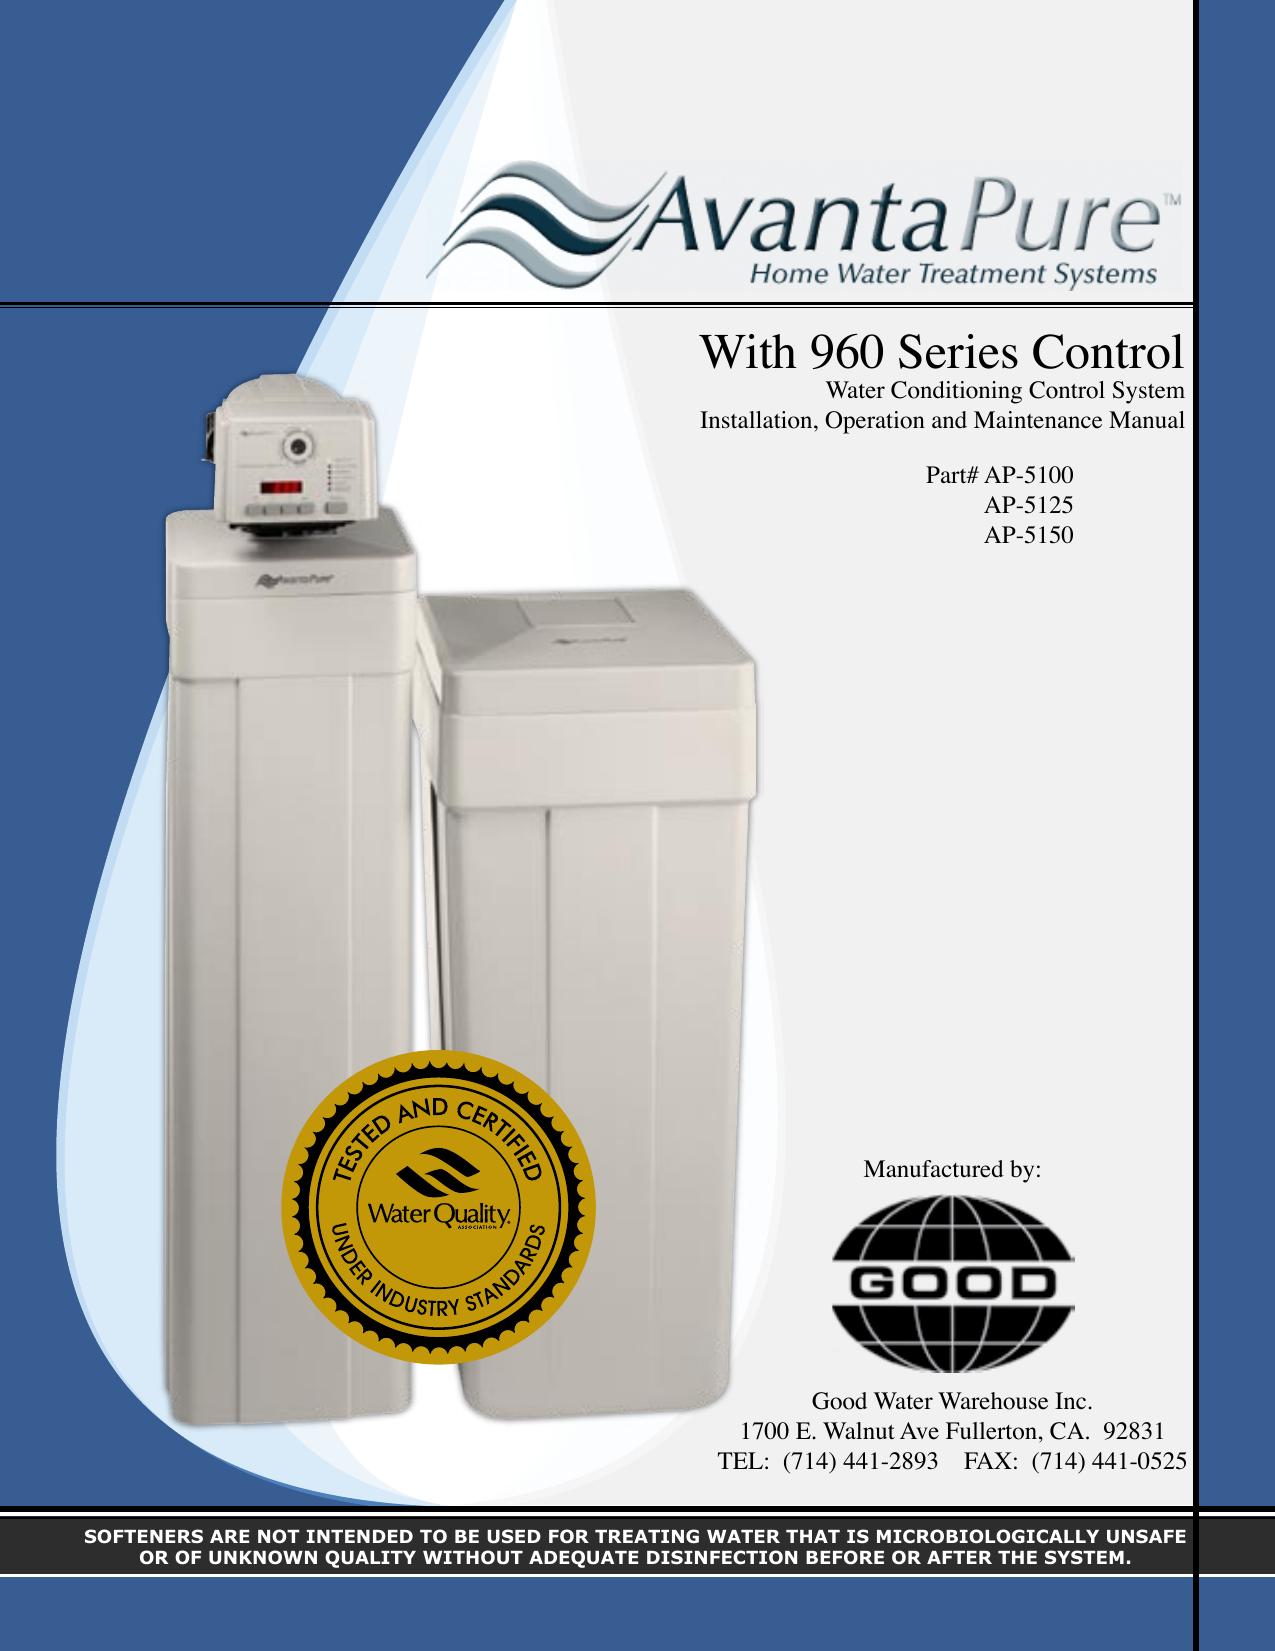 Elegant Avantapure Water softener